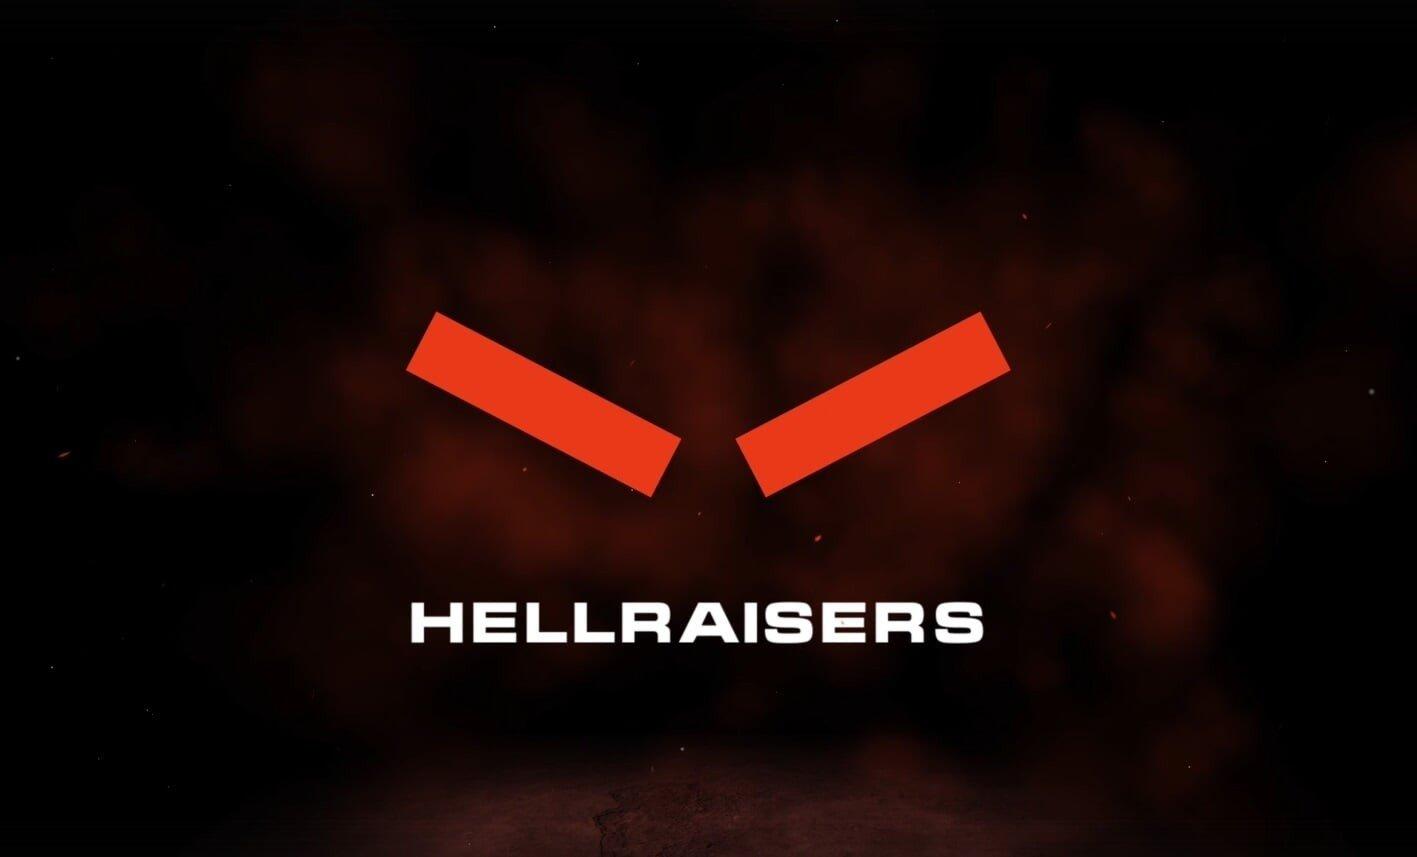 HellRaisers начала сотрудничество с HELL ENERGY